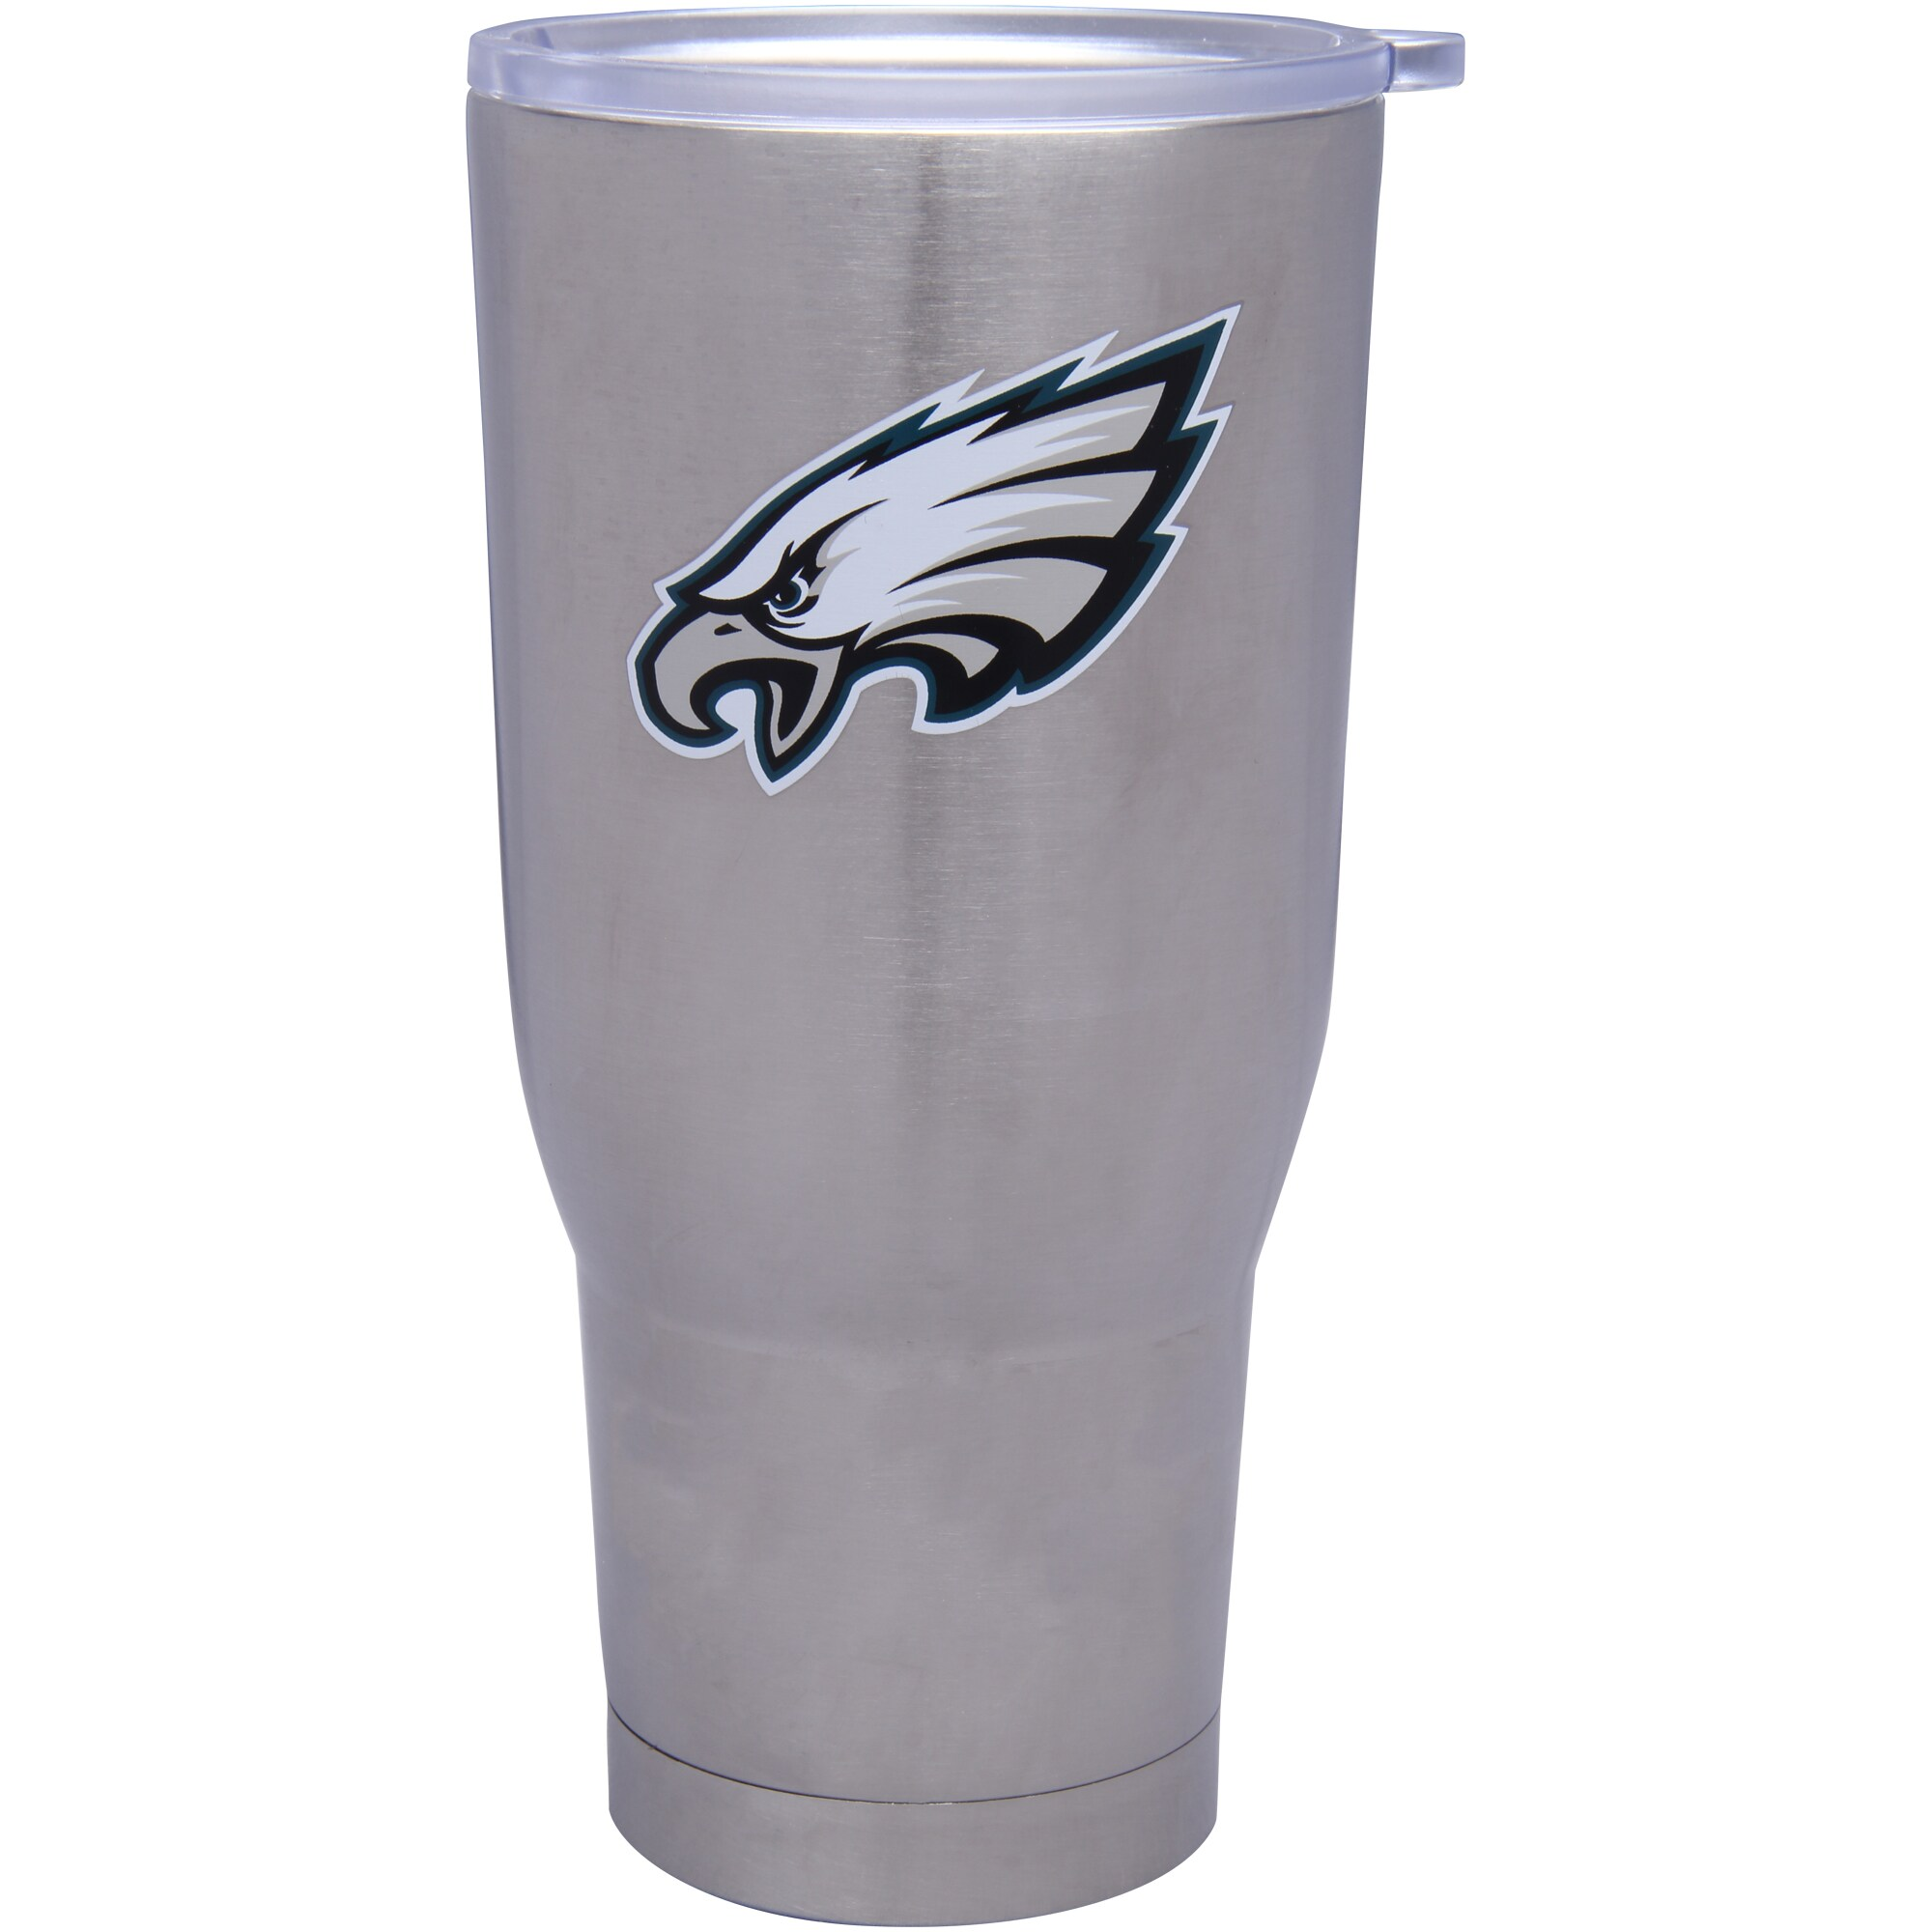 Philadelphia Eagles 32oz. Stainless Steel Keeper Tumbler